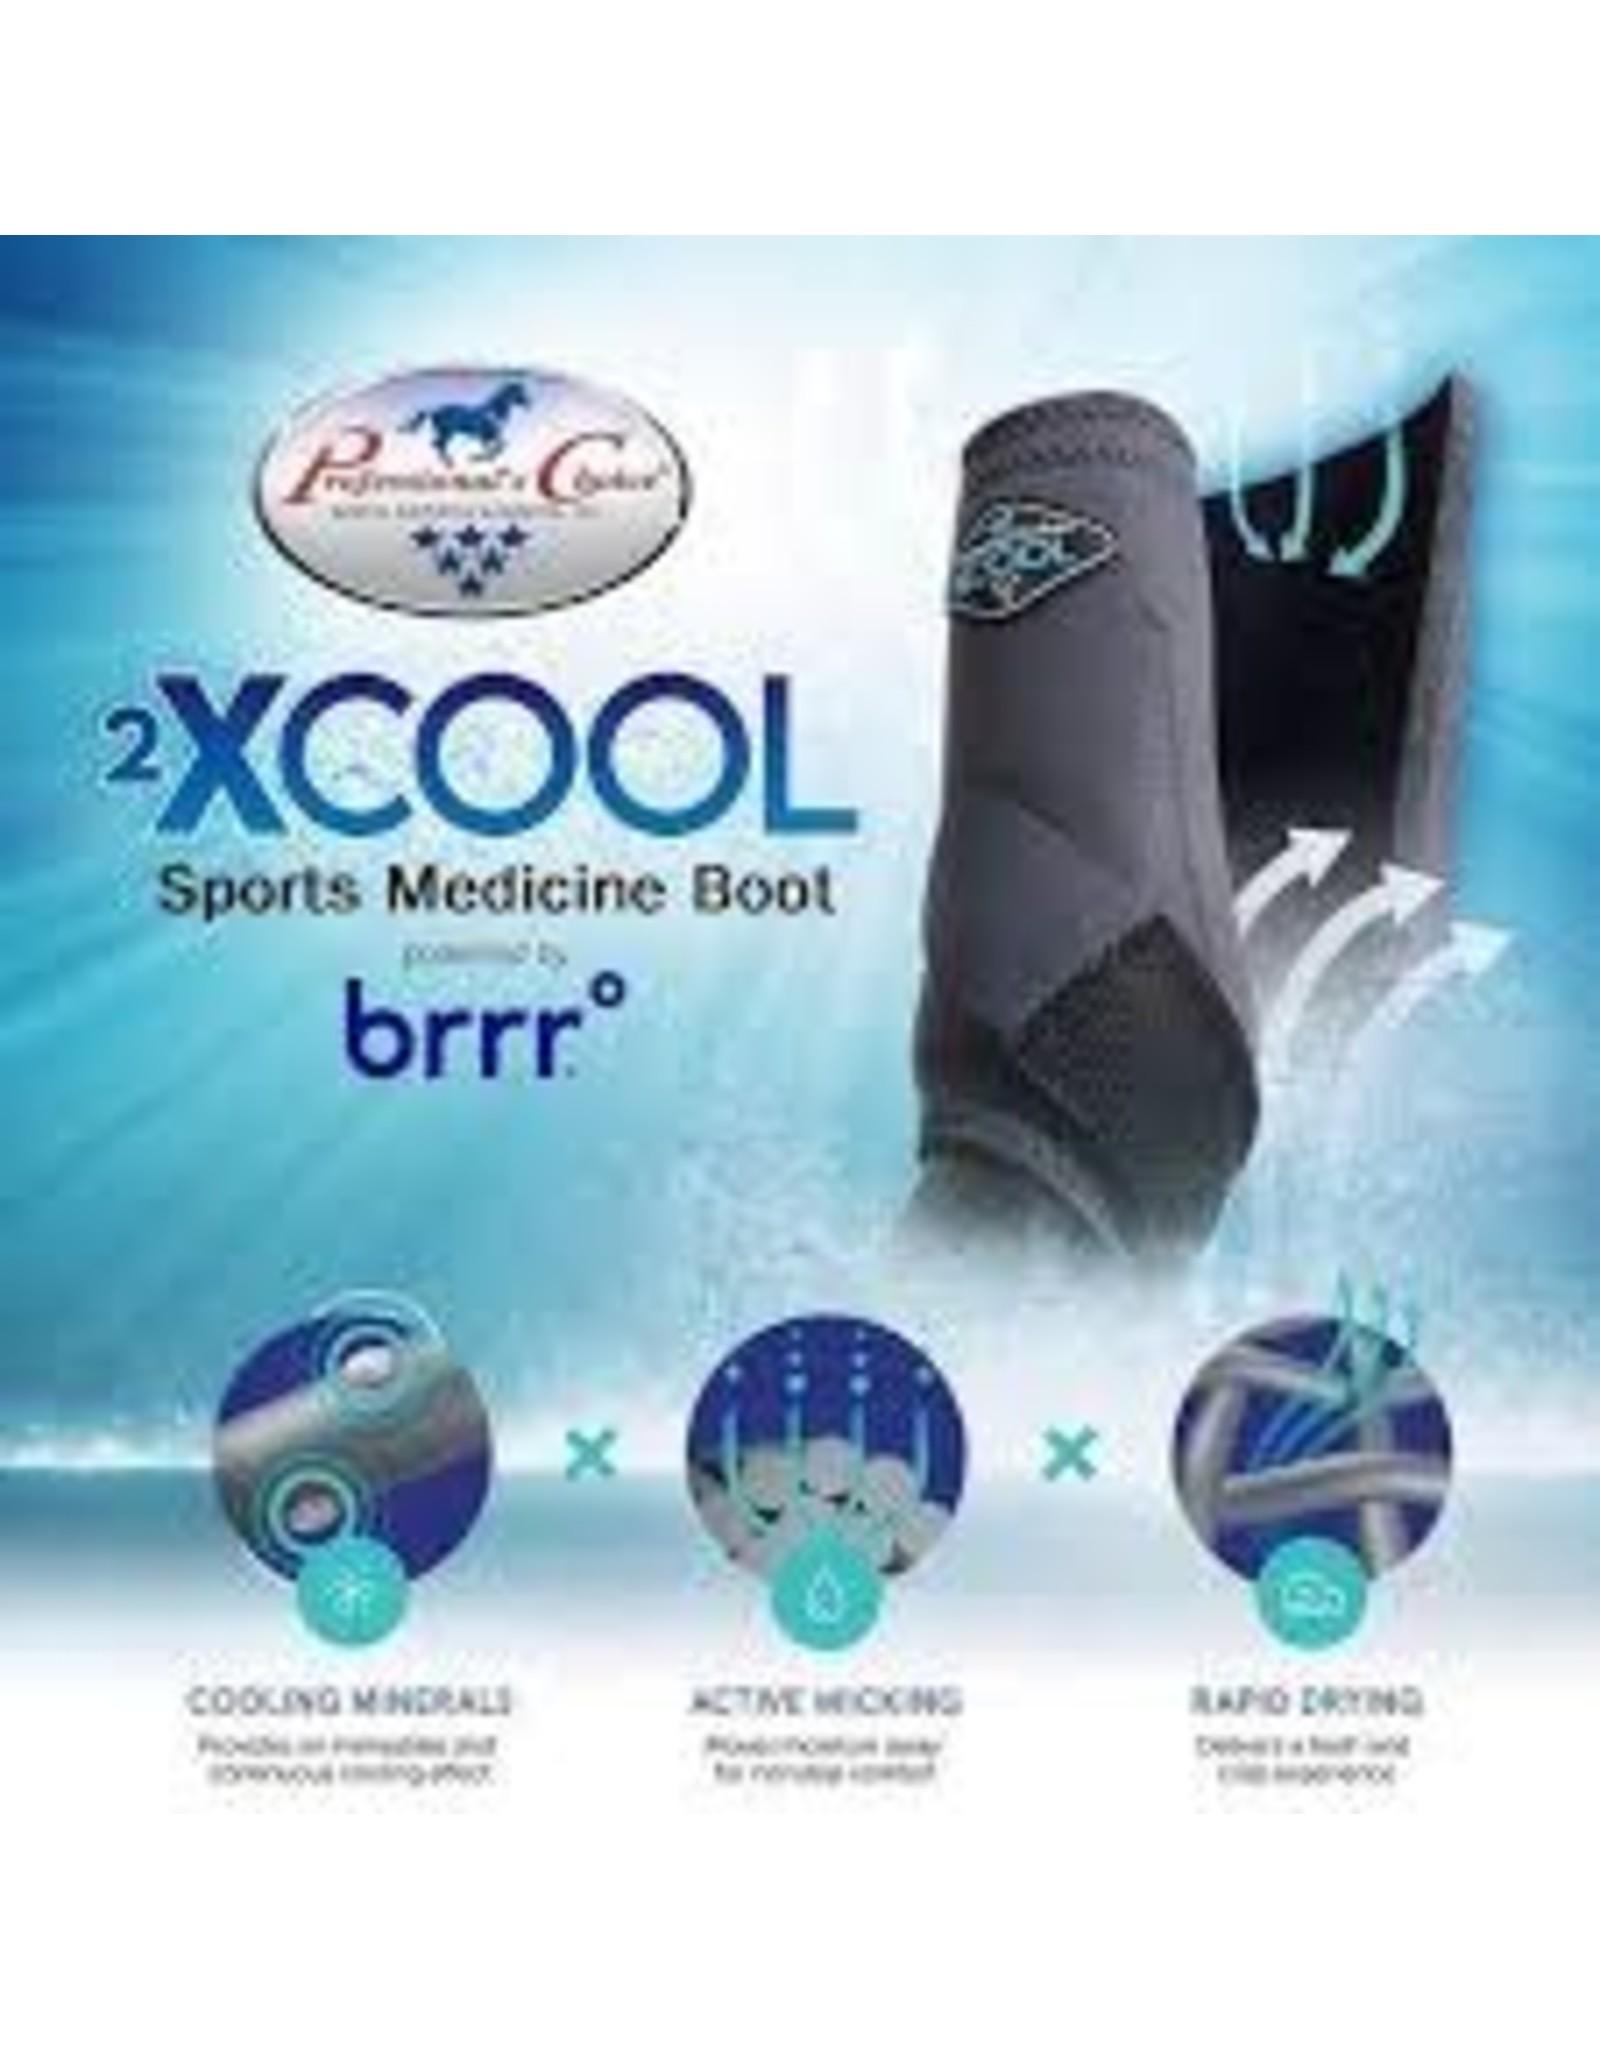 2XCOOL - Sports Medicine Boots -Choclate-*pack of 4*Medium - XC4M-Choclate